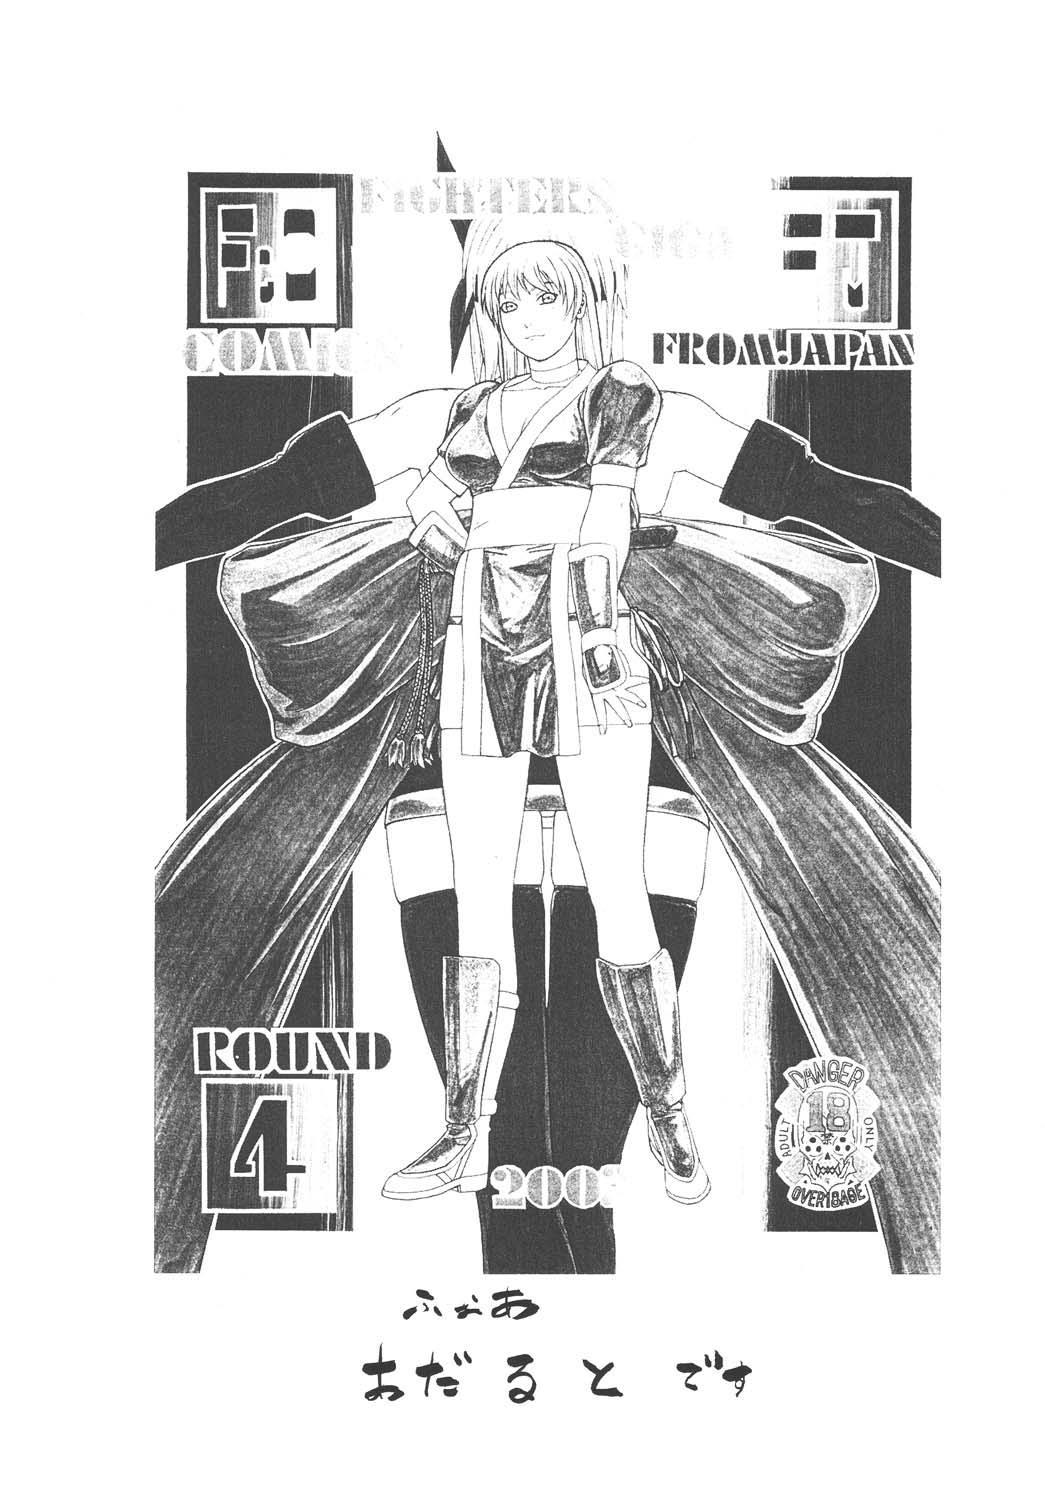 Fighters Giga Comics Round 4 1